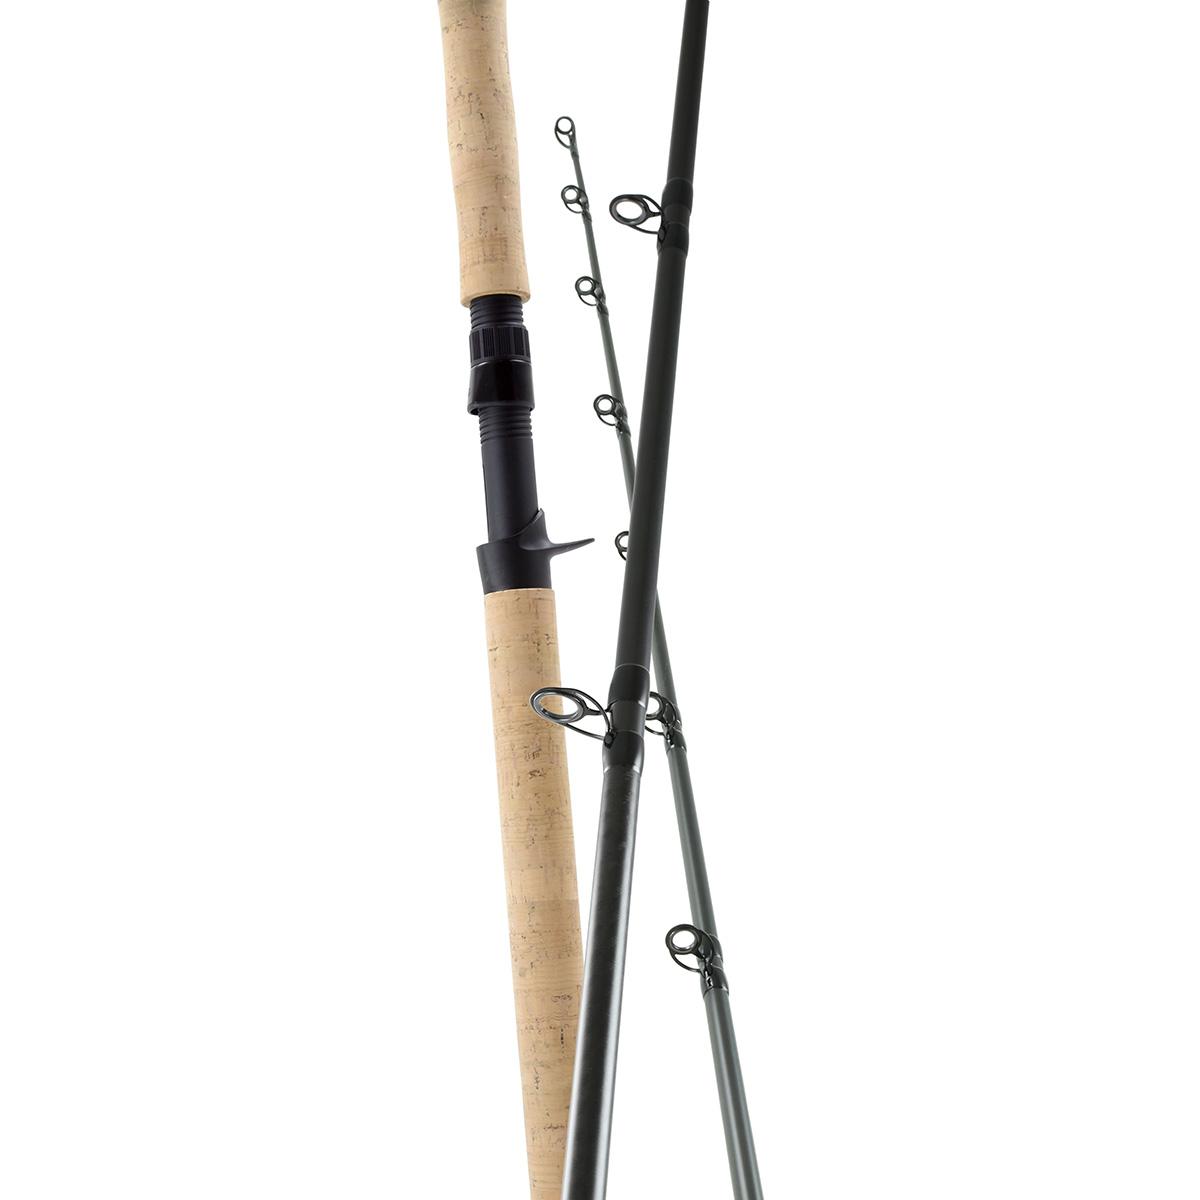 Evx Musky Rod Okuma Fishing Rods And Reels Okuma